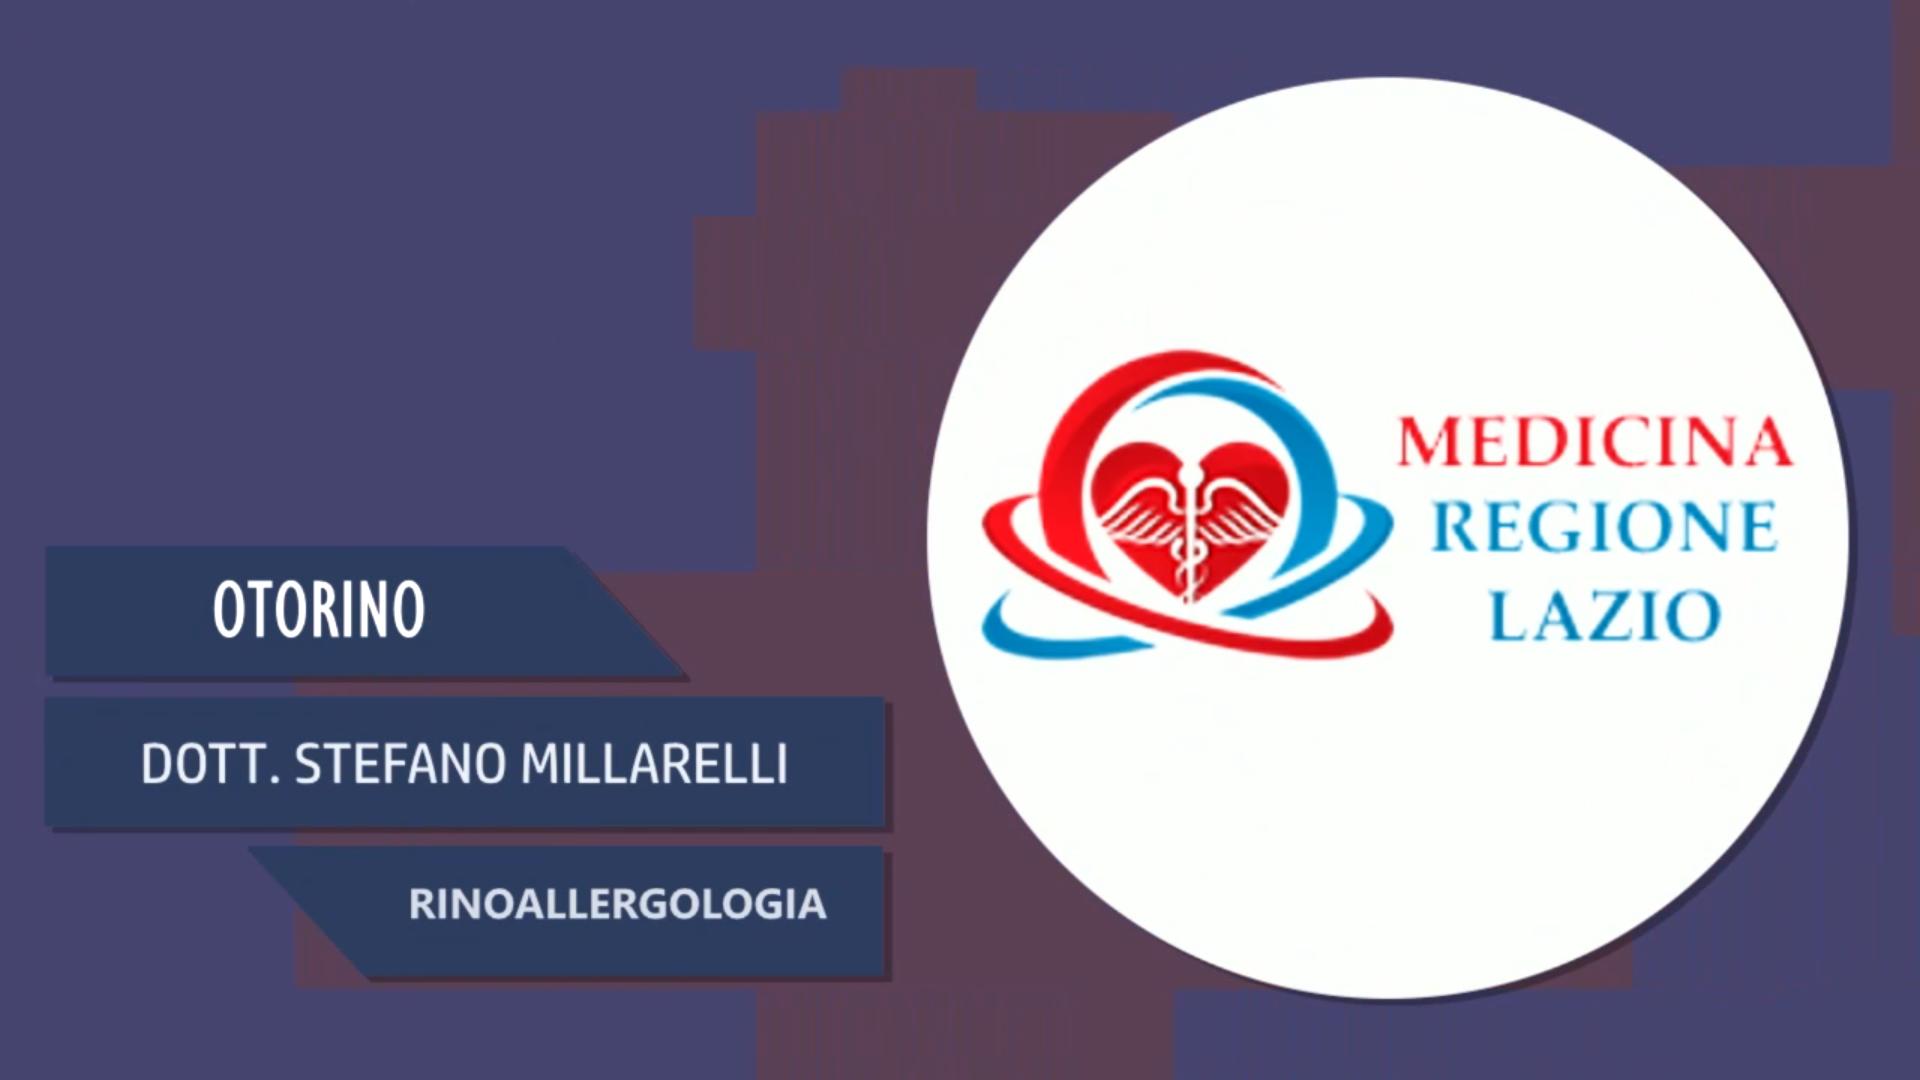 Intervista al Dott. Stefano Millarelli – Rinoallergologia